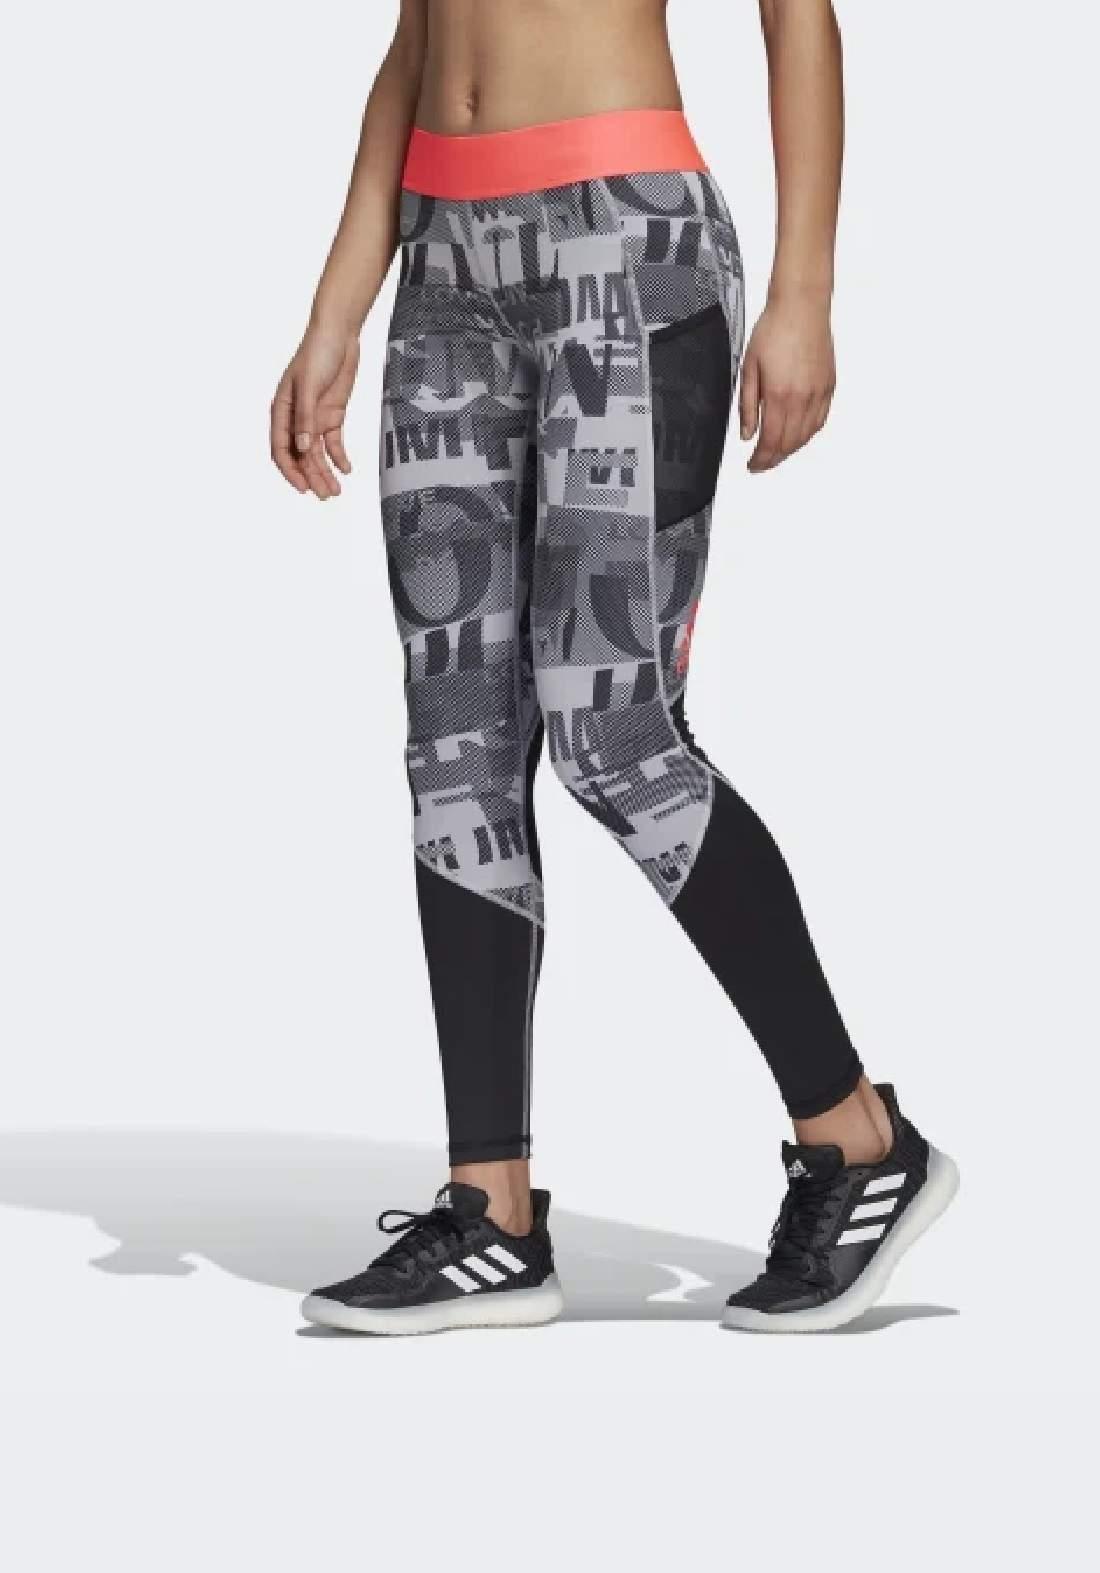 Adidas ستريج نسائي رياضي متعدد الالوان من